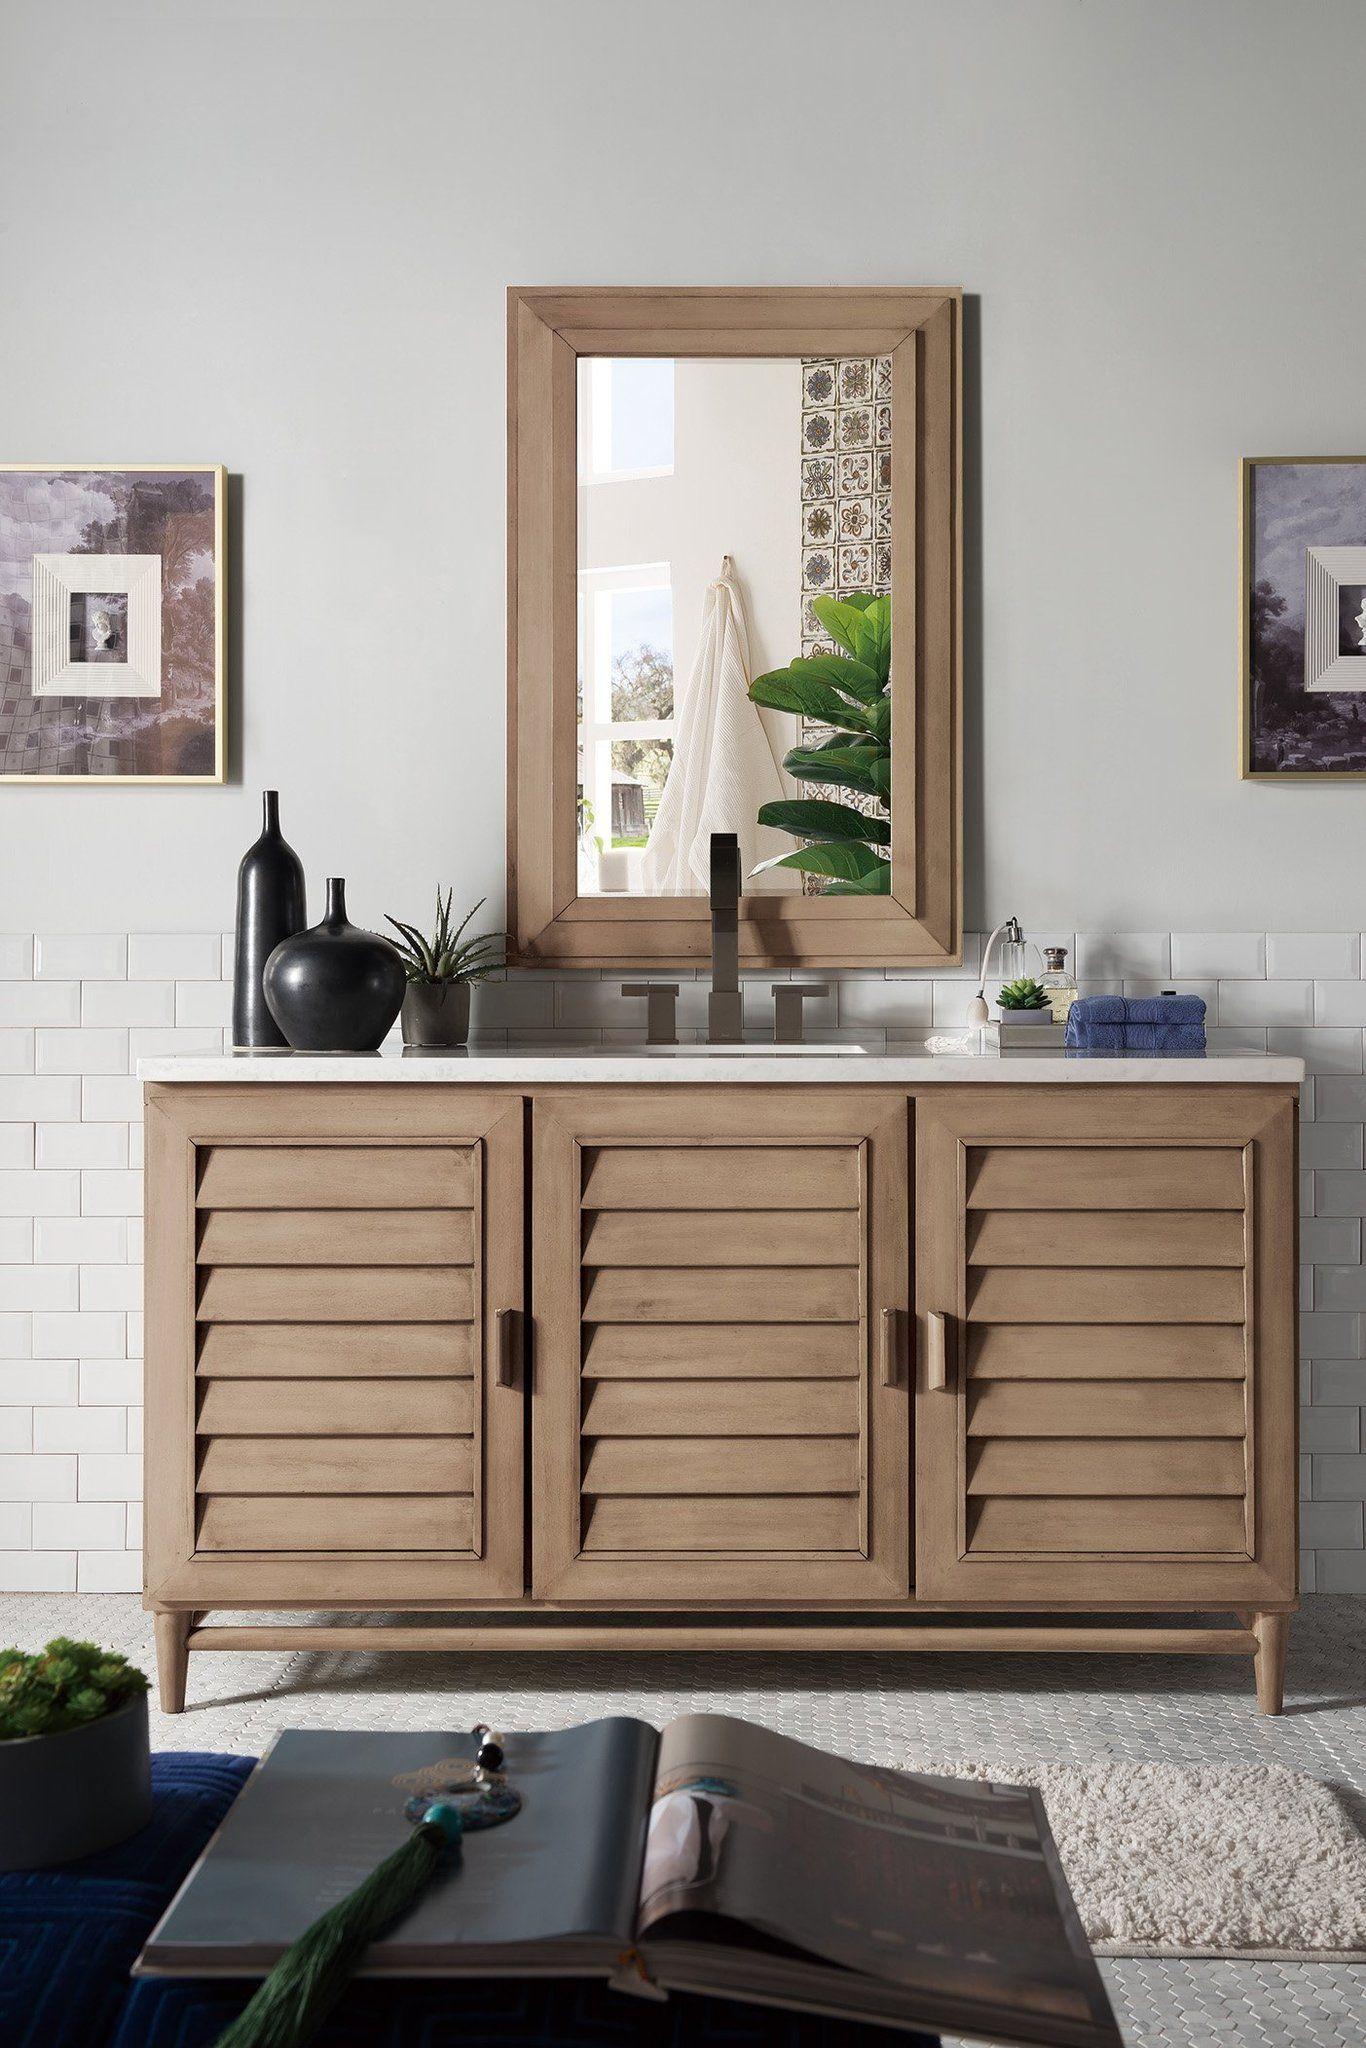 Portland 60 Single Bathroom Vanity In 2021 Single Bathroom Vanity Modern Bathroom Vanity Vanity Design